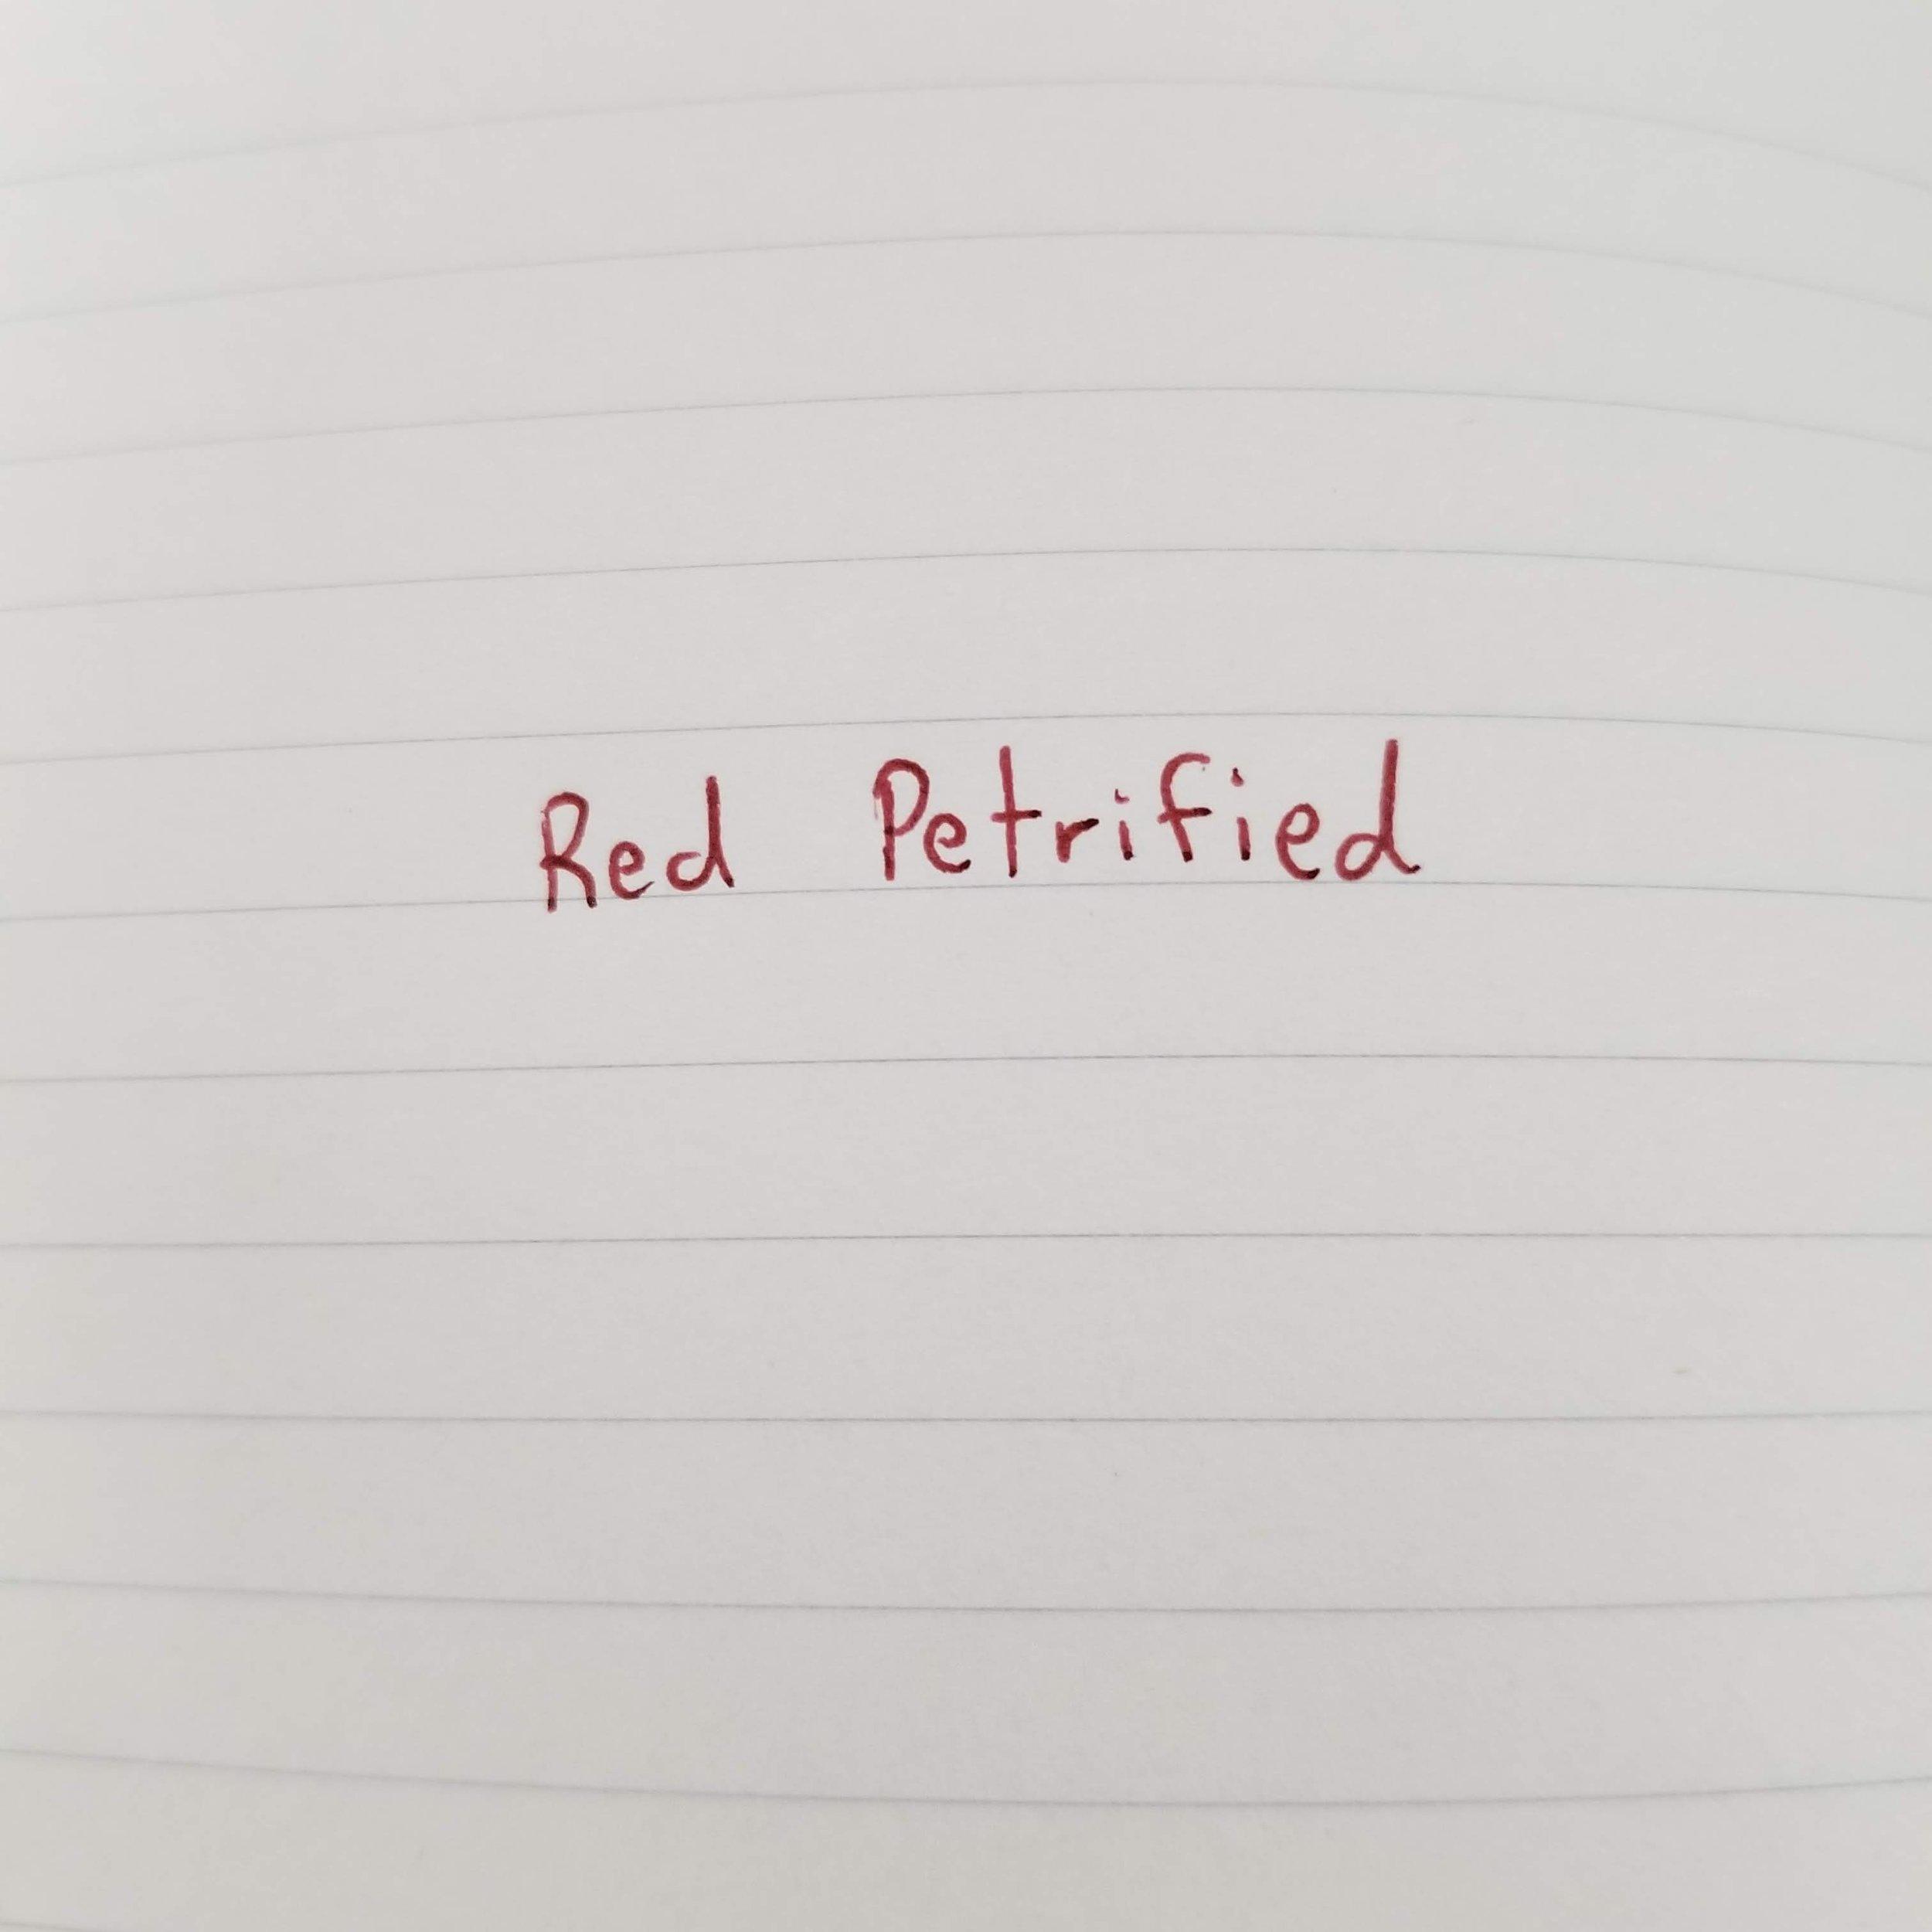 Red Petrified